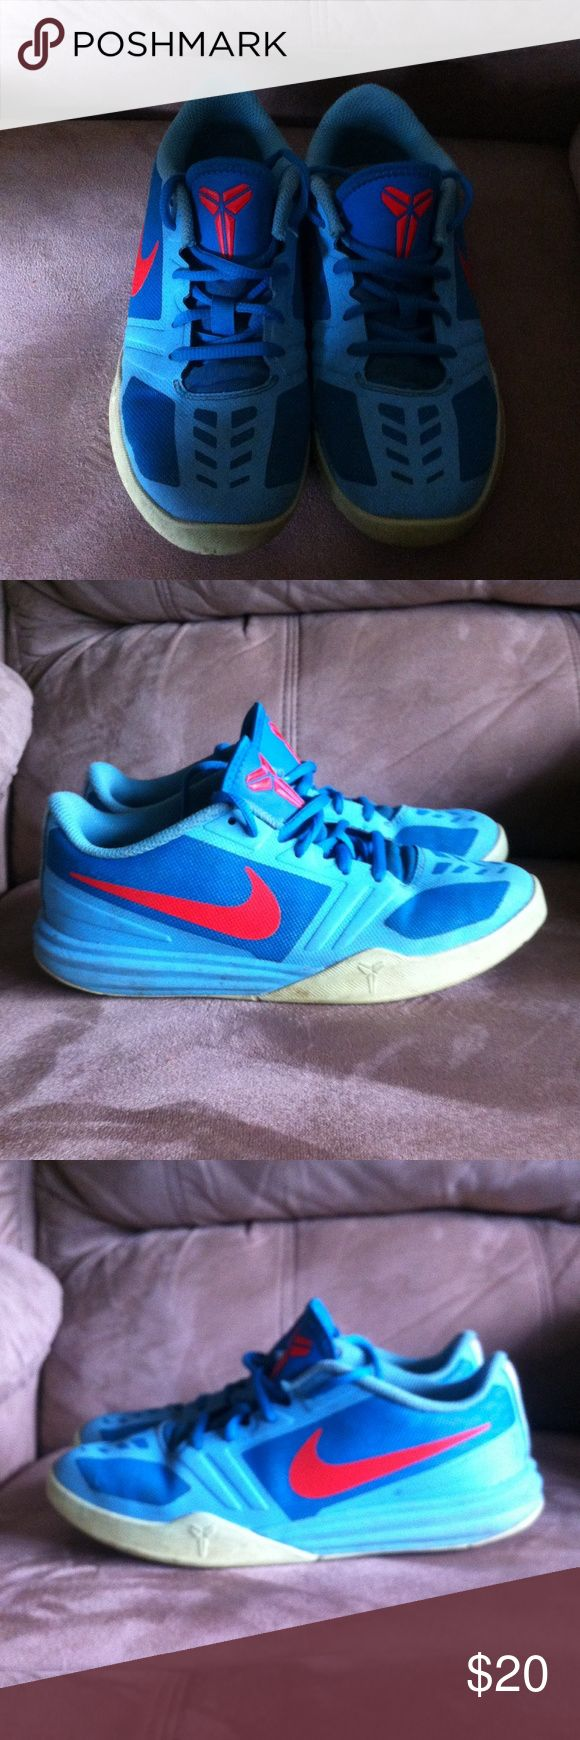 Boys Nike Basketball shoes Boys Nike Kobe Bryant basketball shoes Nike Shoes Sneakers